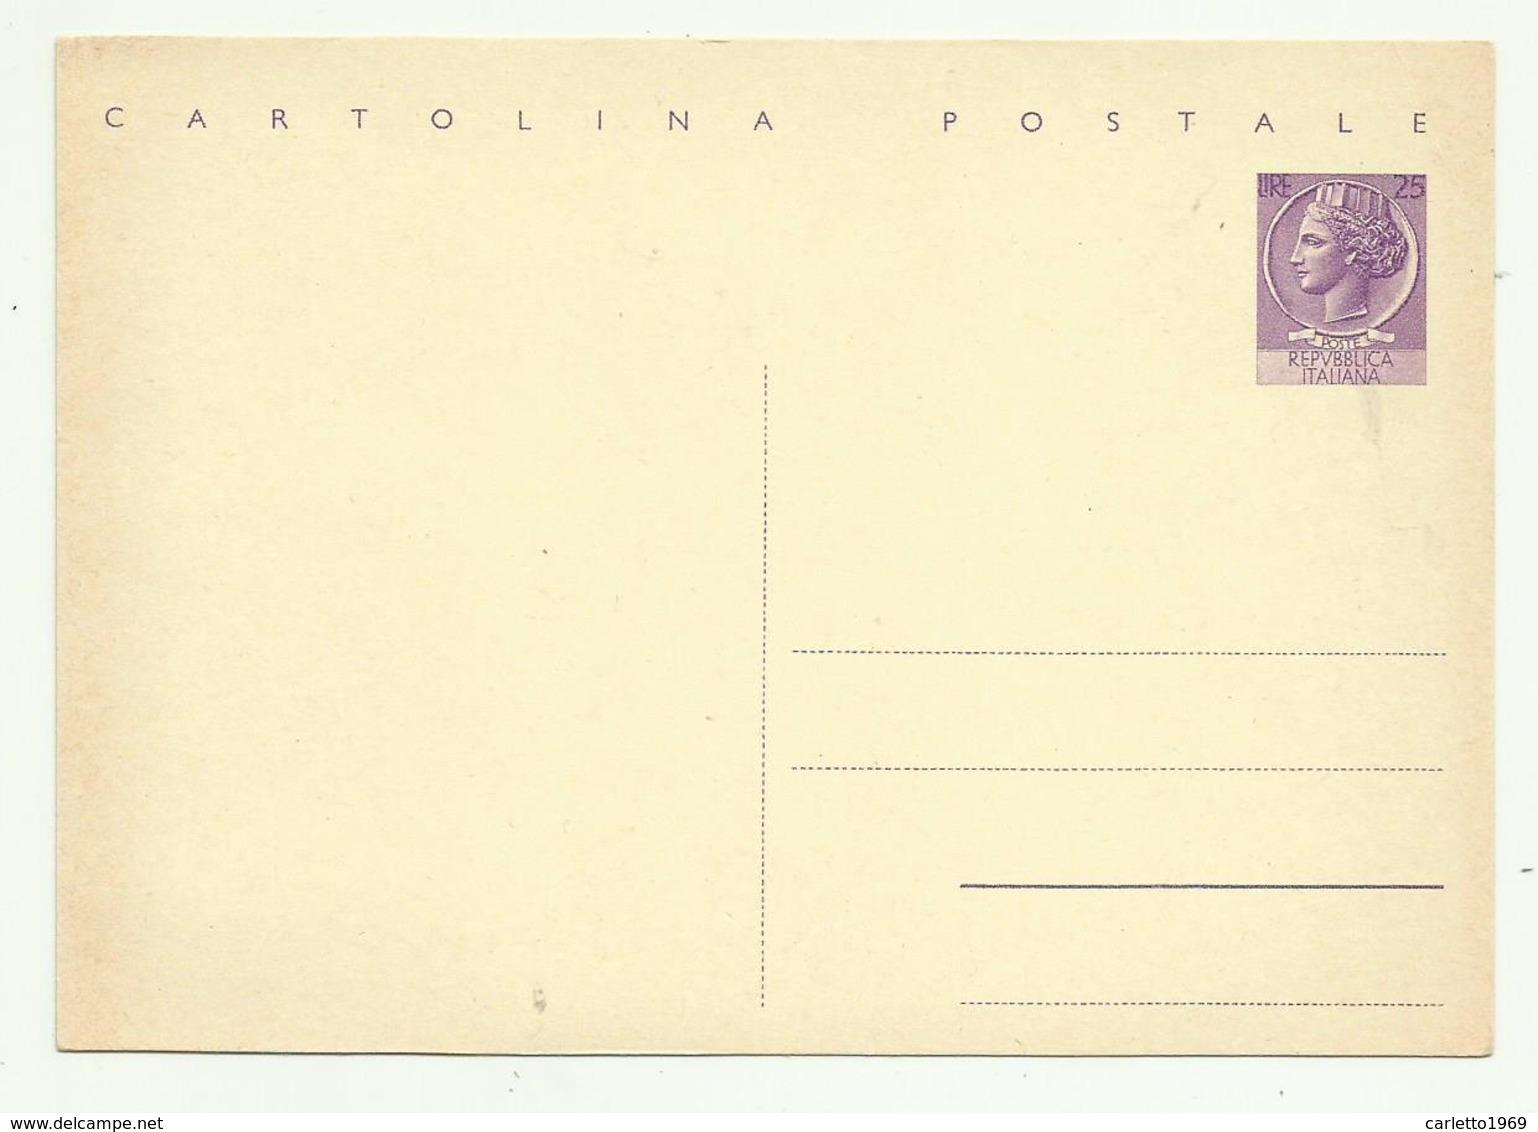 CARTOLINA POSTALE - LIRE 25 INTERO POSTALE - 6. 1946-.. Republic